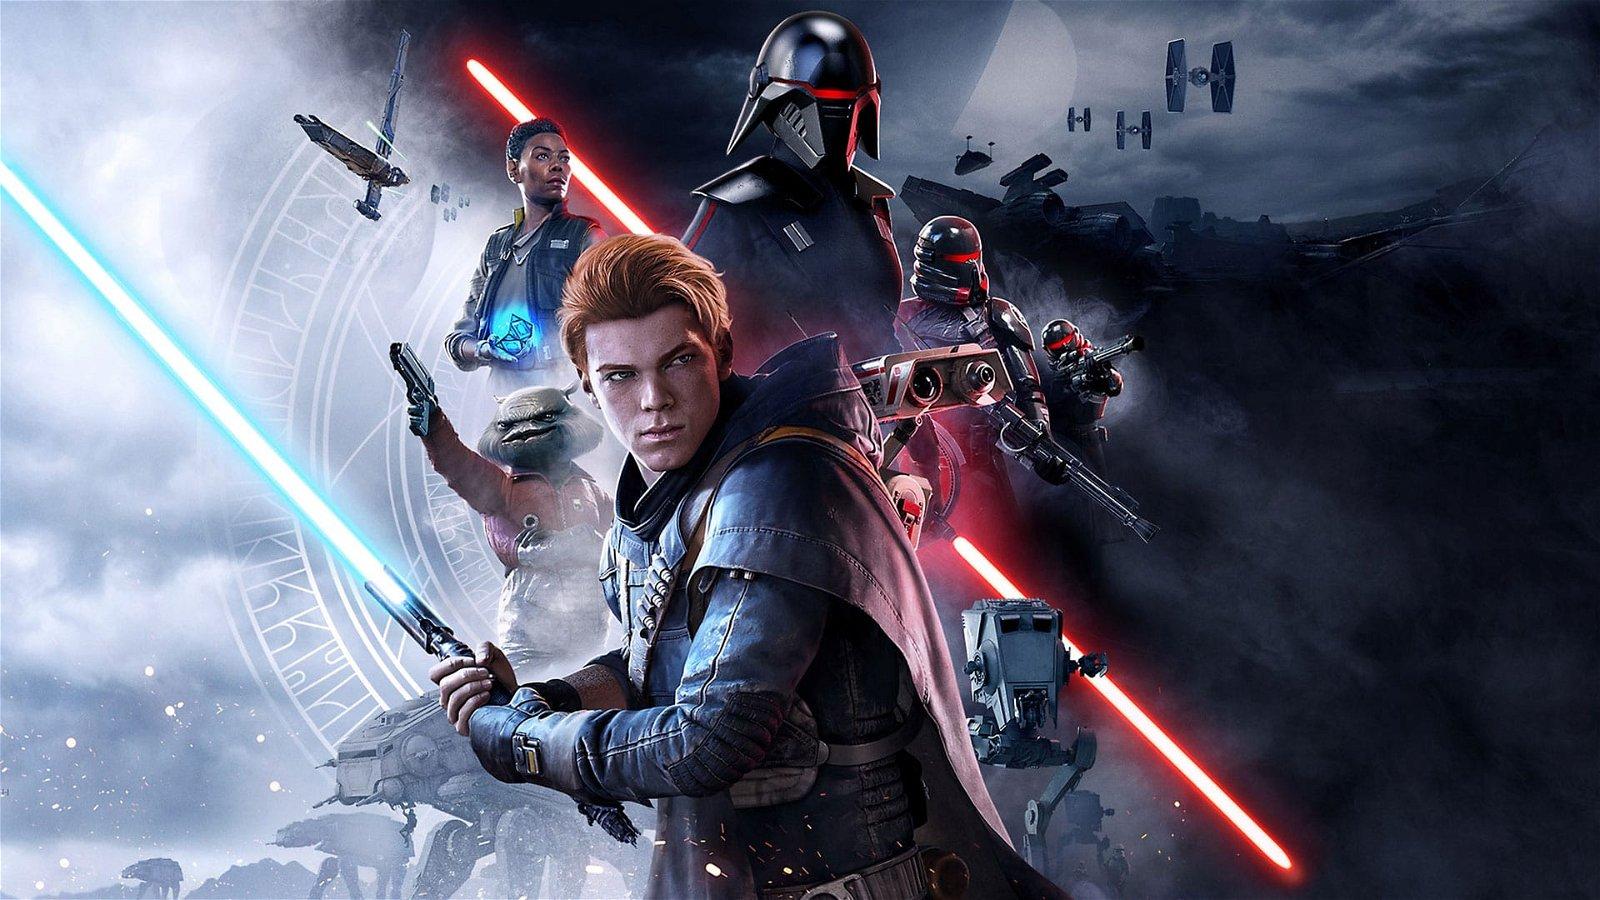 Tour De Force: A Star Wars Jedi: Fallen Order Preview 1